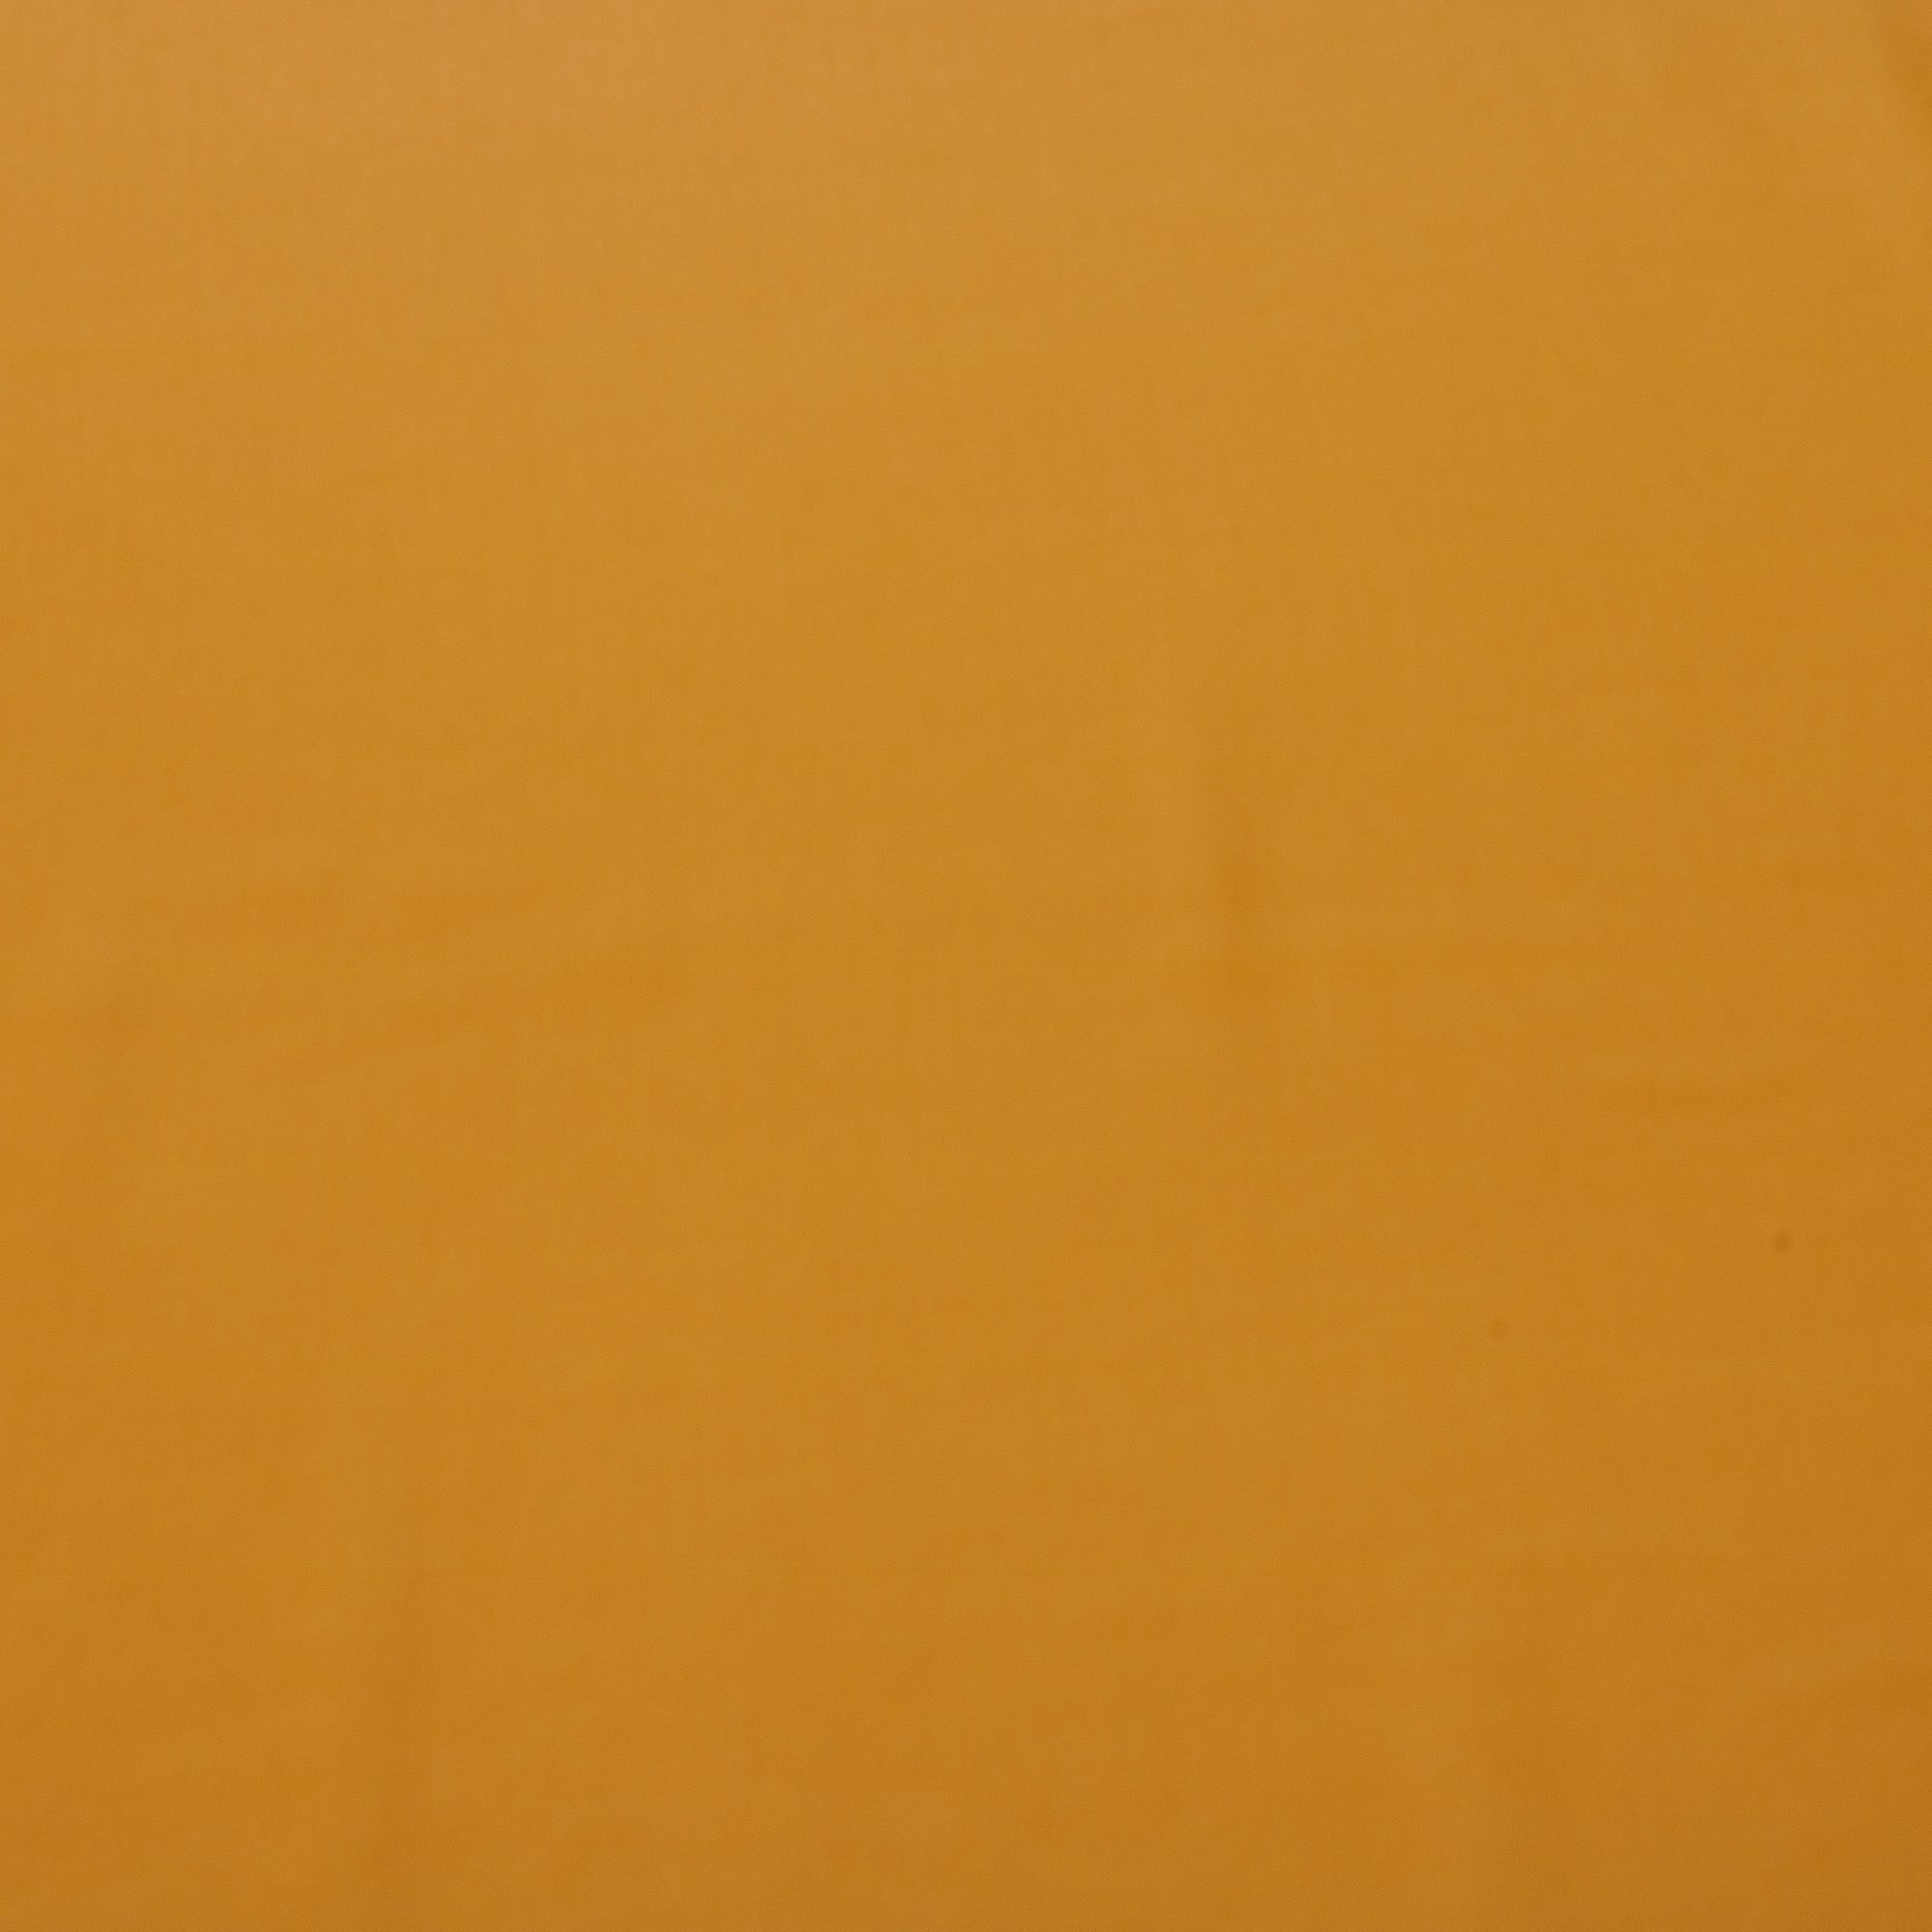 Tecido Viscose Mostarda 100% Viscose 1,40 m Largura